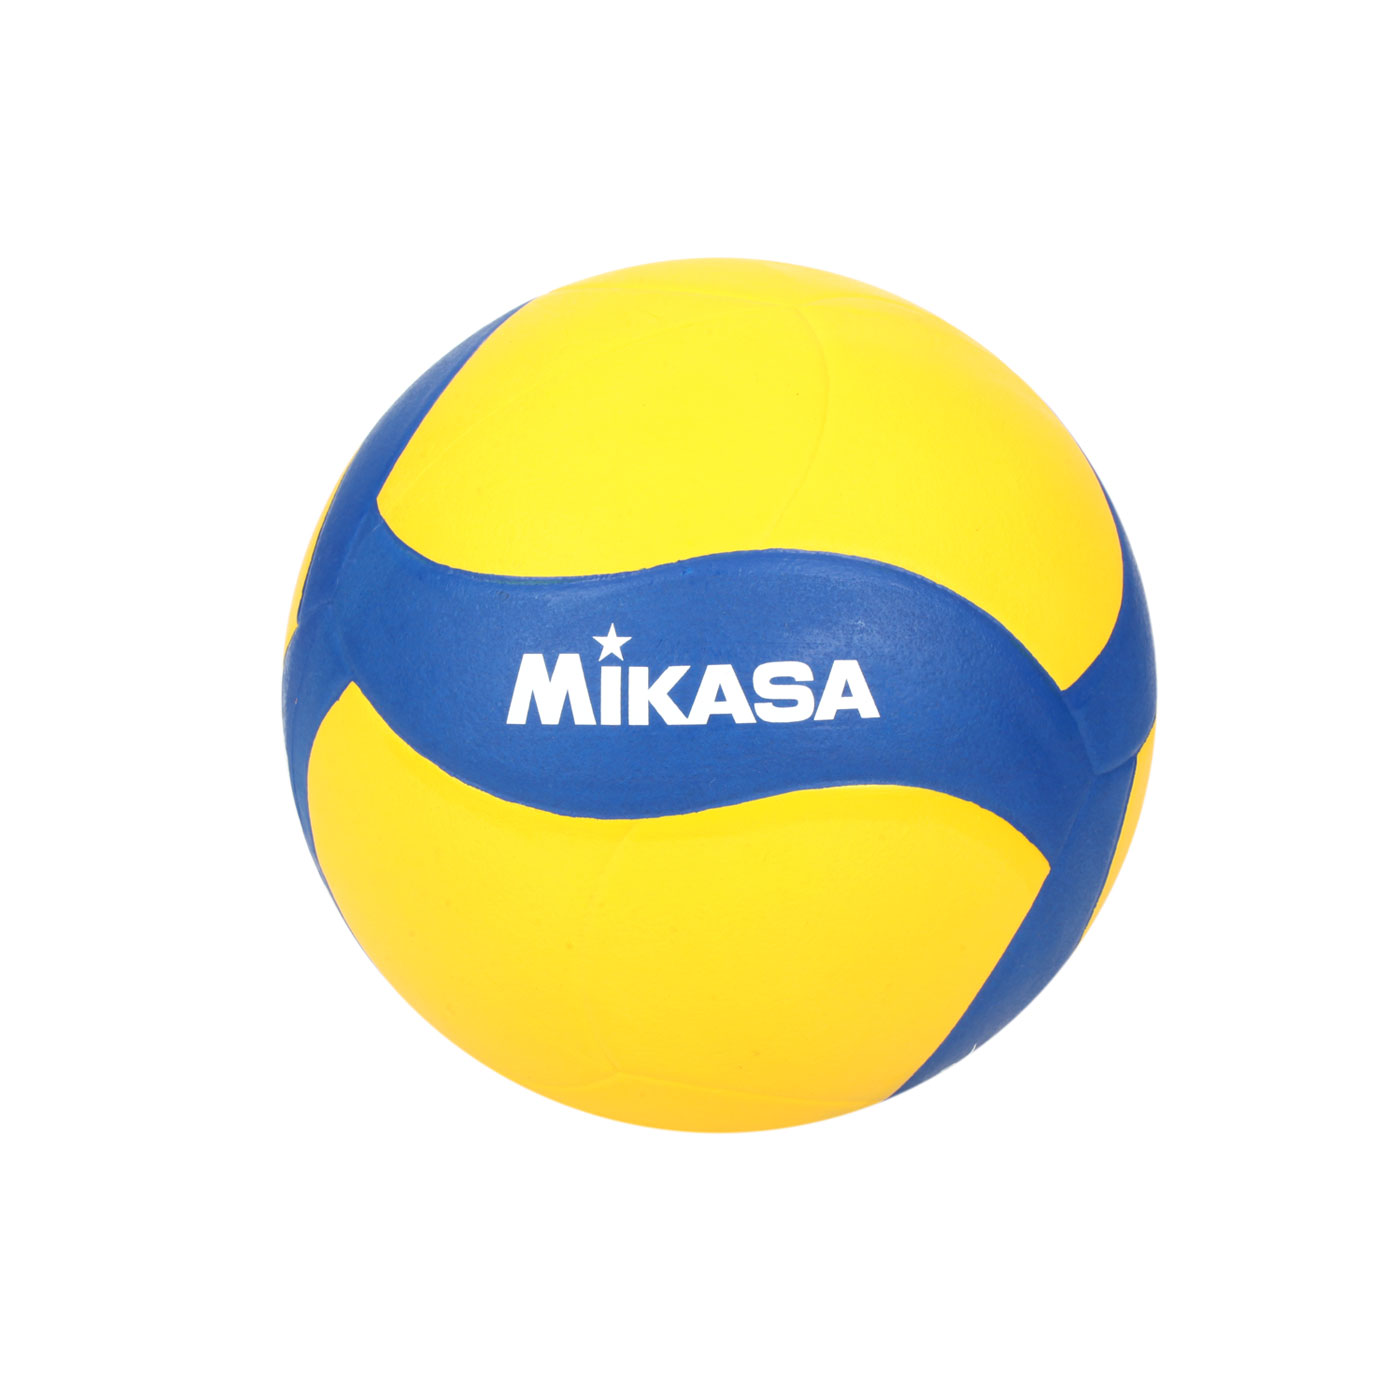 MIKASA 螺旋型軟橡膠排球#3 V023WS - 黃藍白